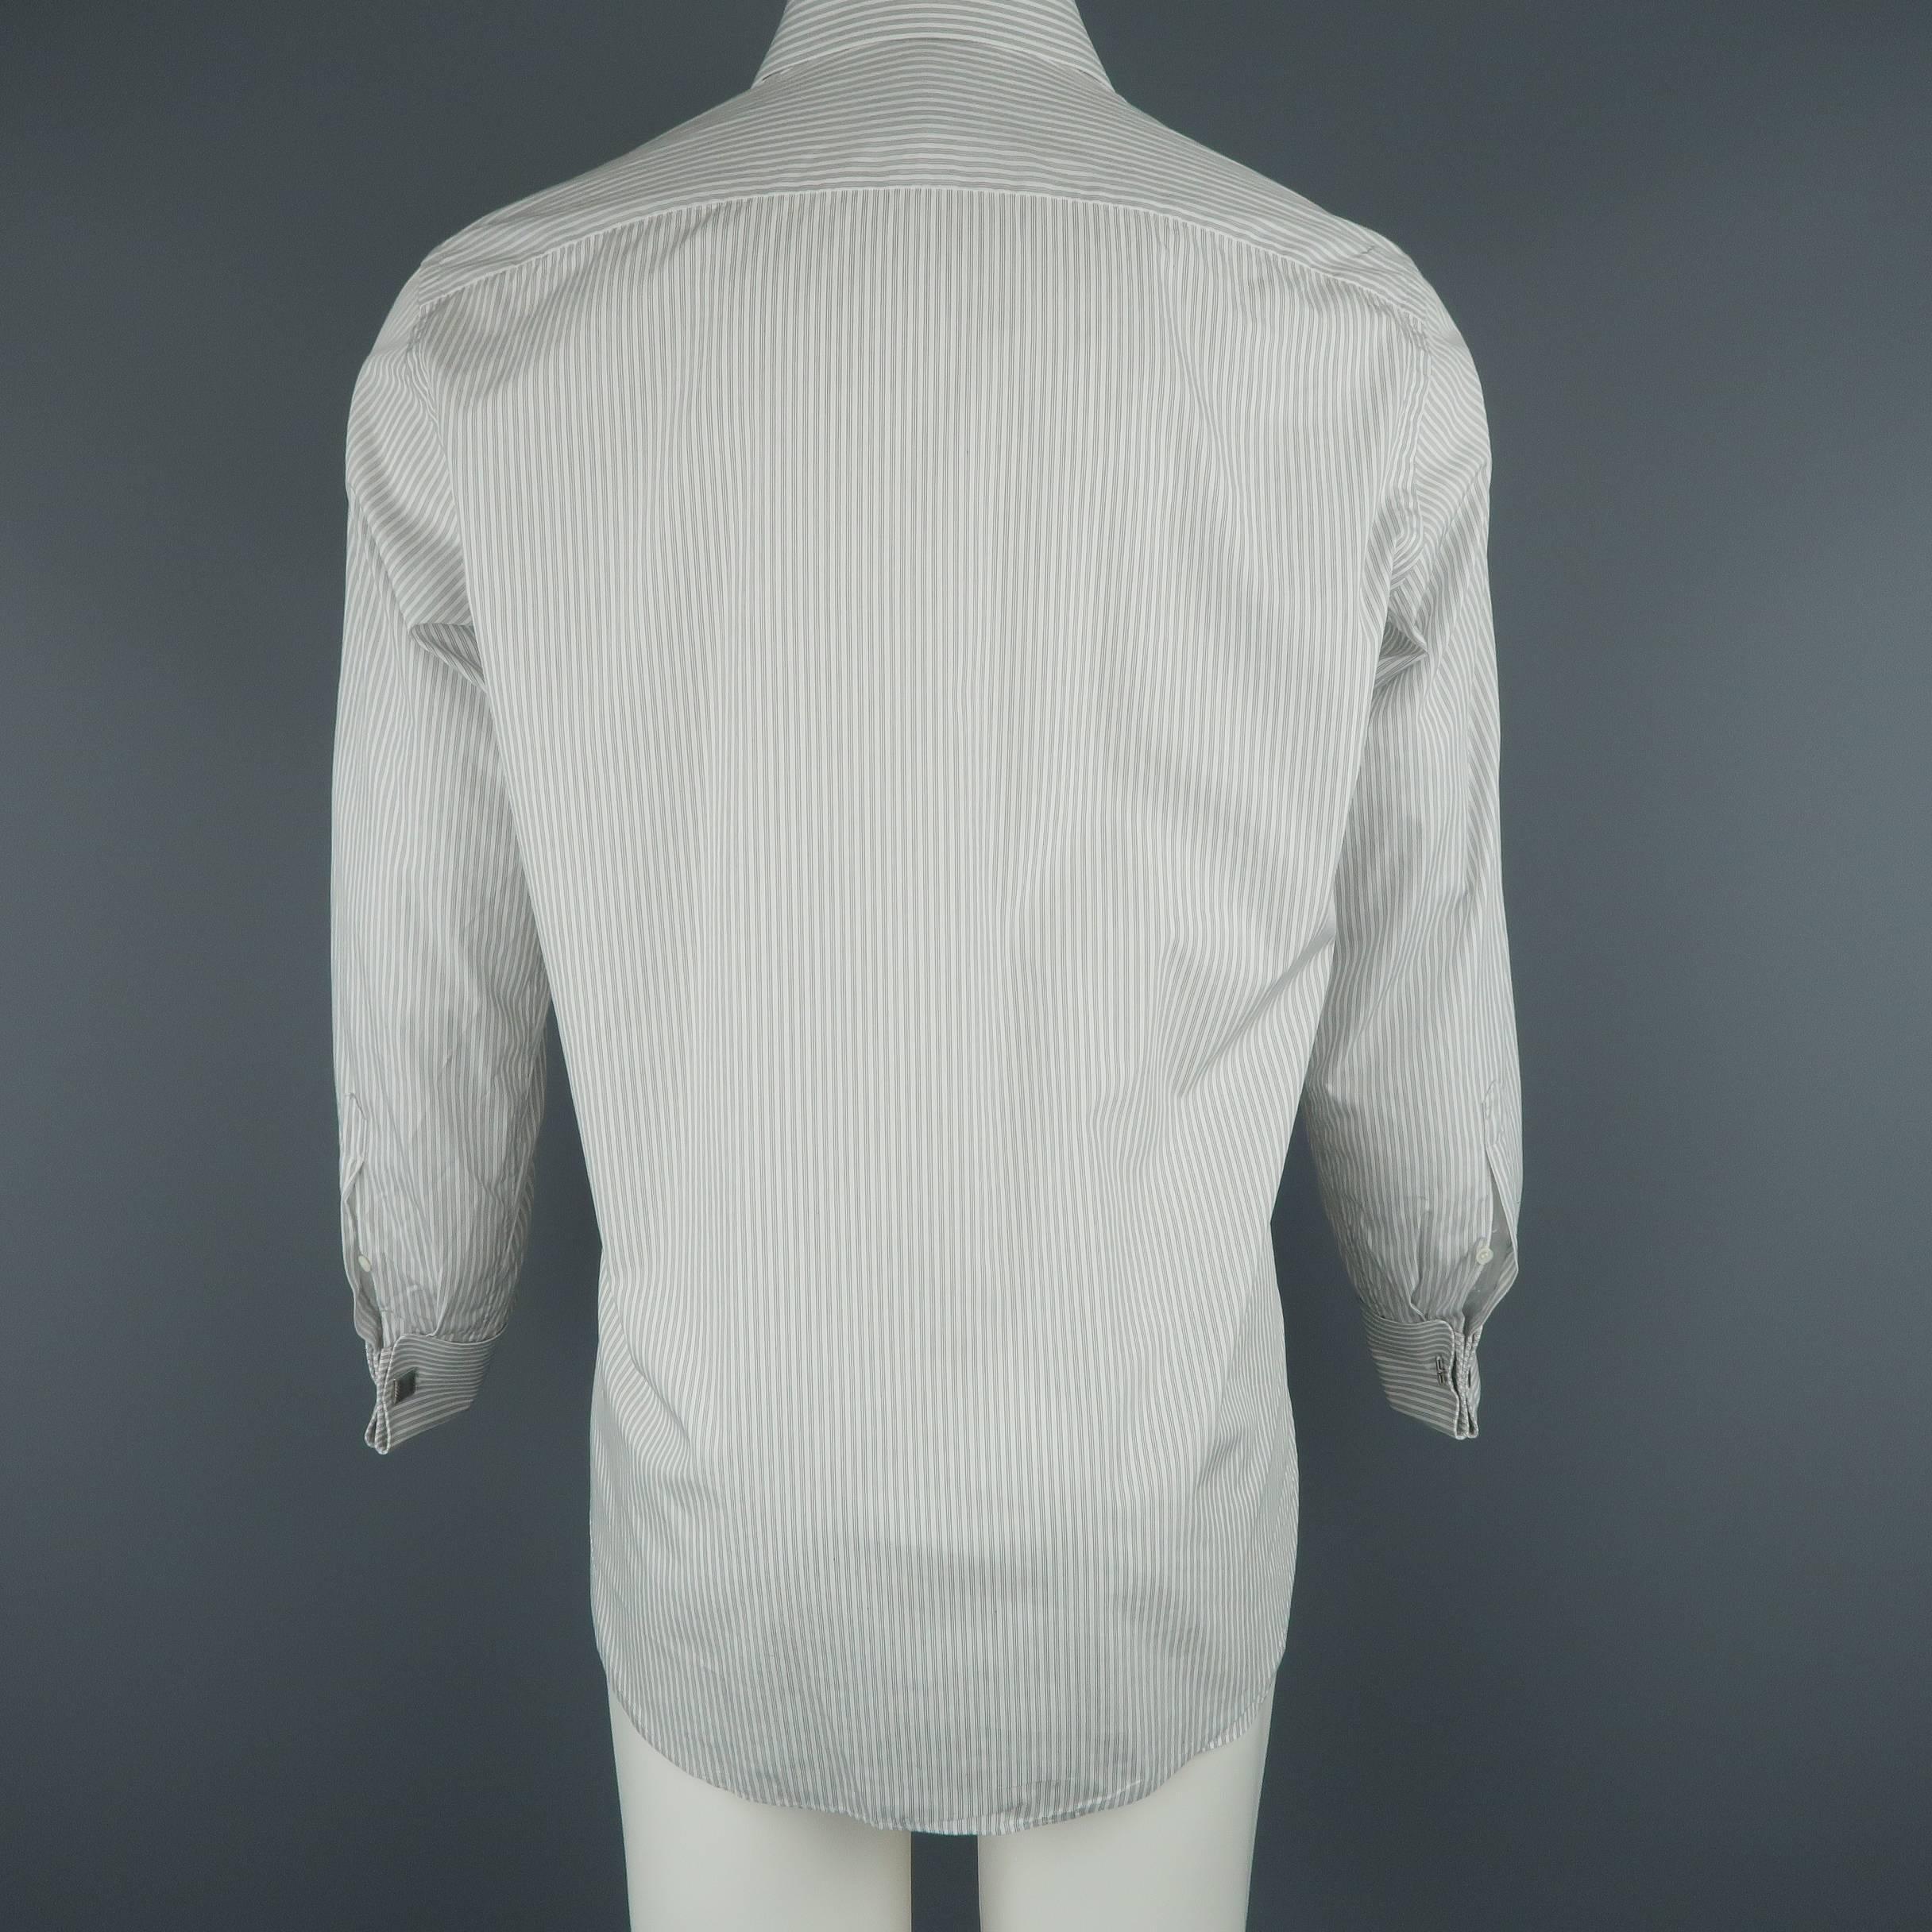 15.5 Brioni Mens Ivory Striped Shirt 39